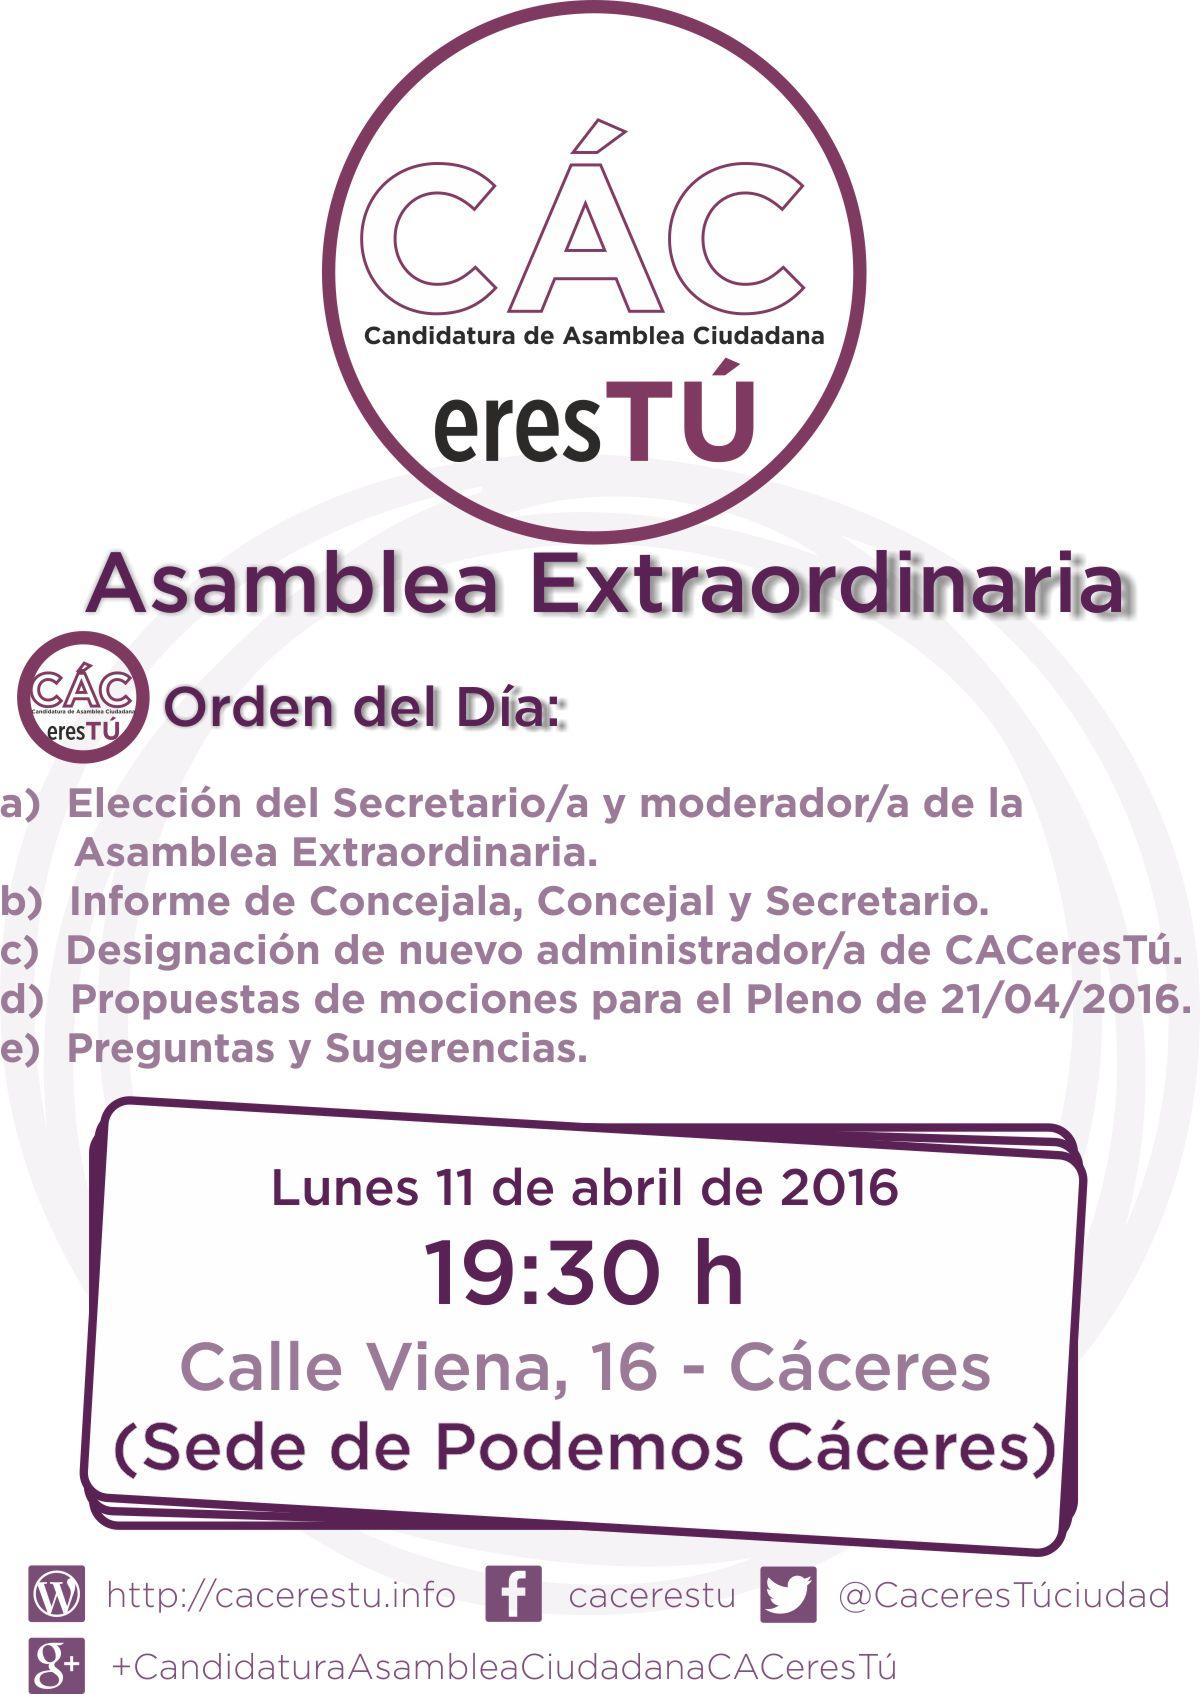 Asamblea Extraordinaria 11 de abril de 2016